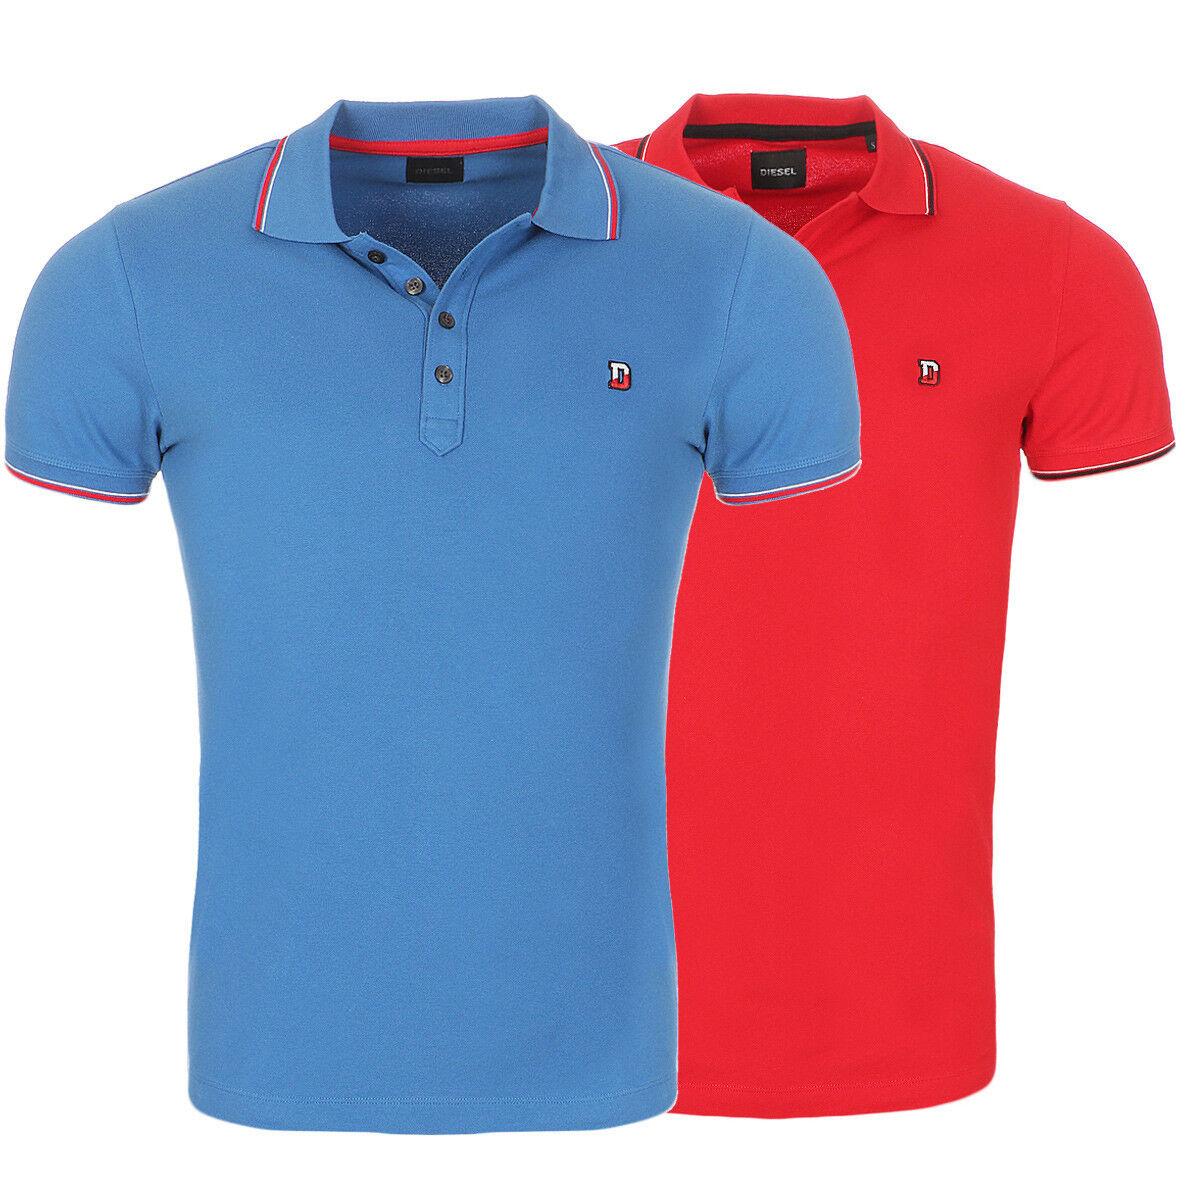 Diesel Polohemd T-SKIN Herren Polo Shirt Poloshirt Hemd blau rot kurzarm NEU